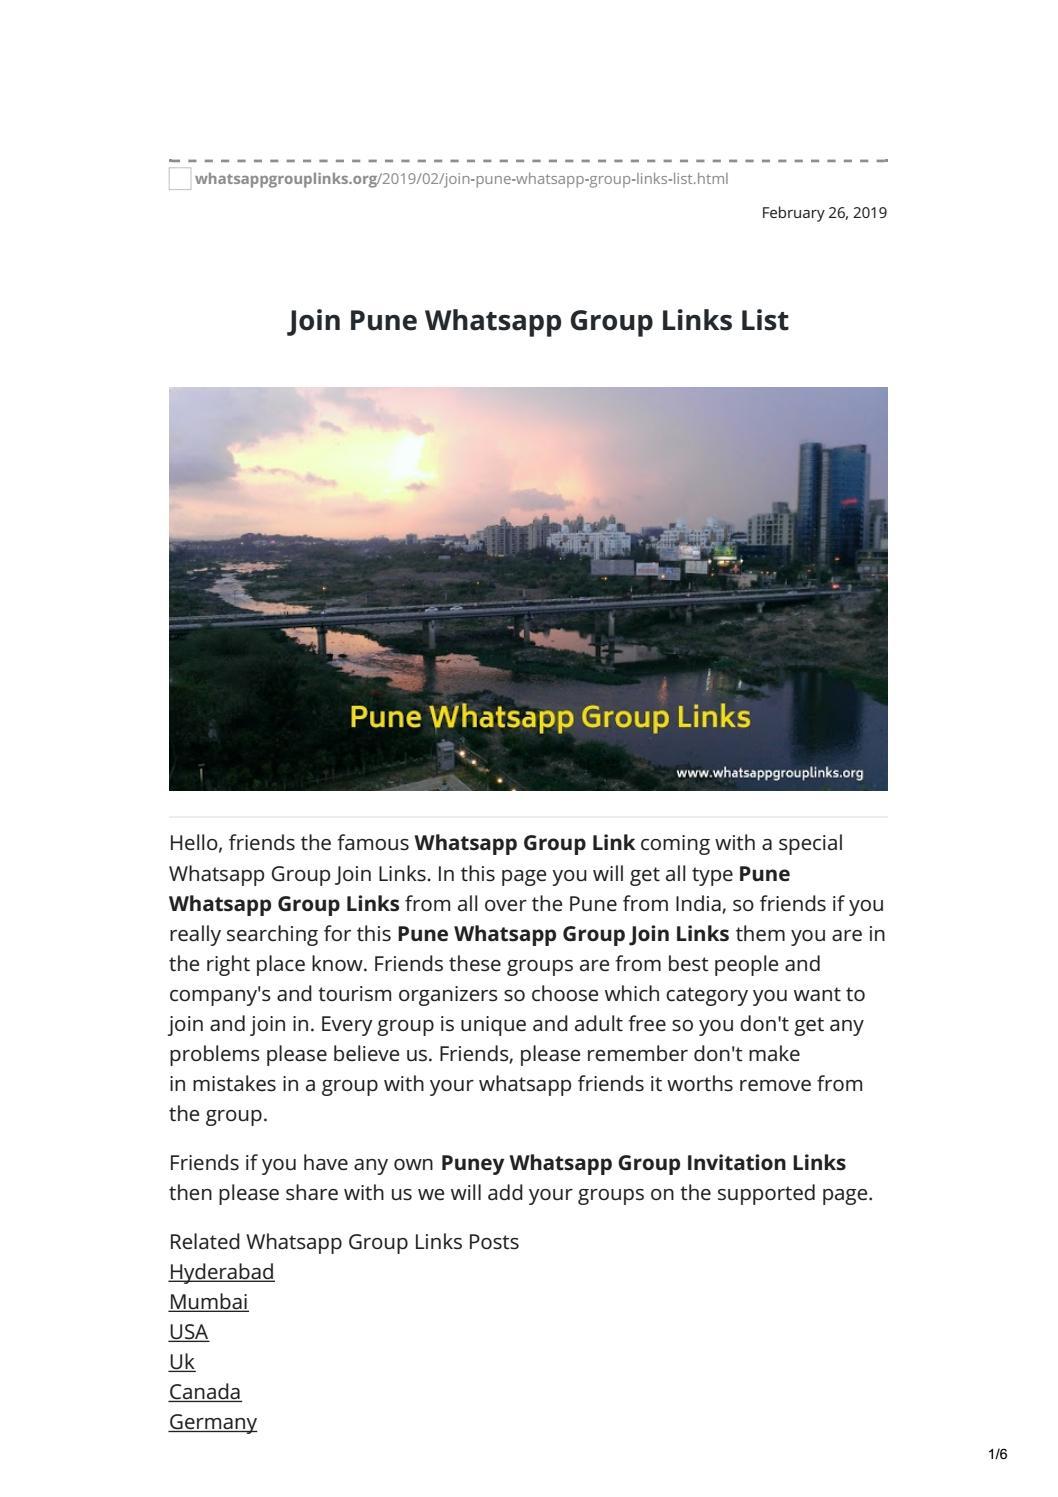 pune whatsapp group links by whatsapp group links - issuu